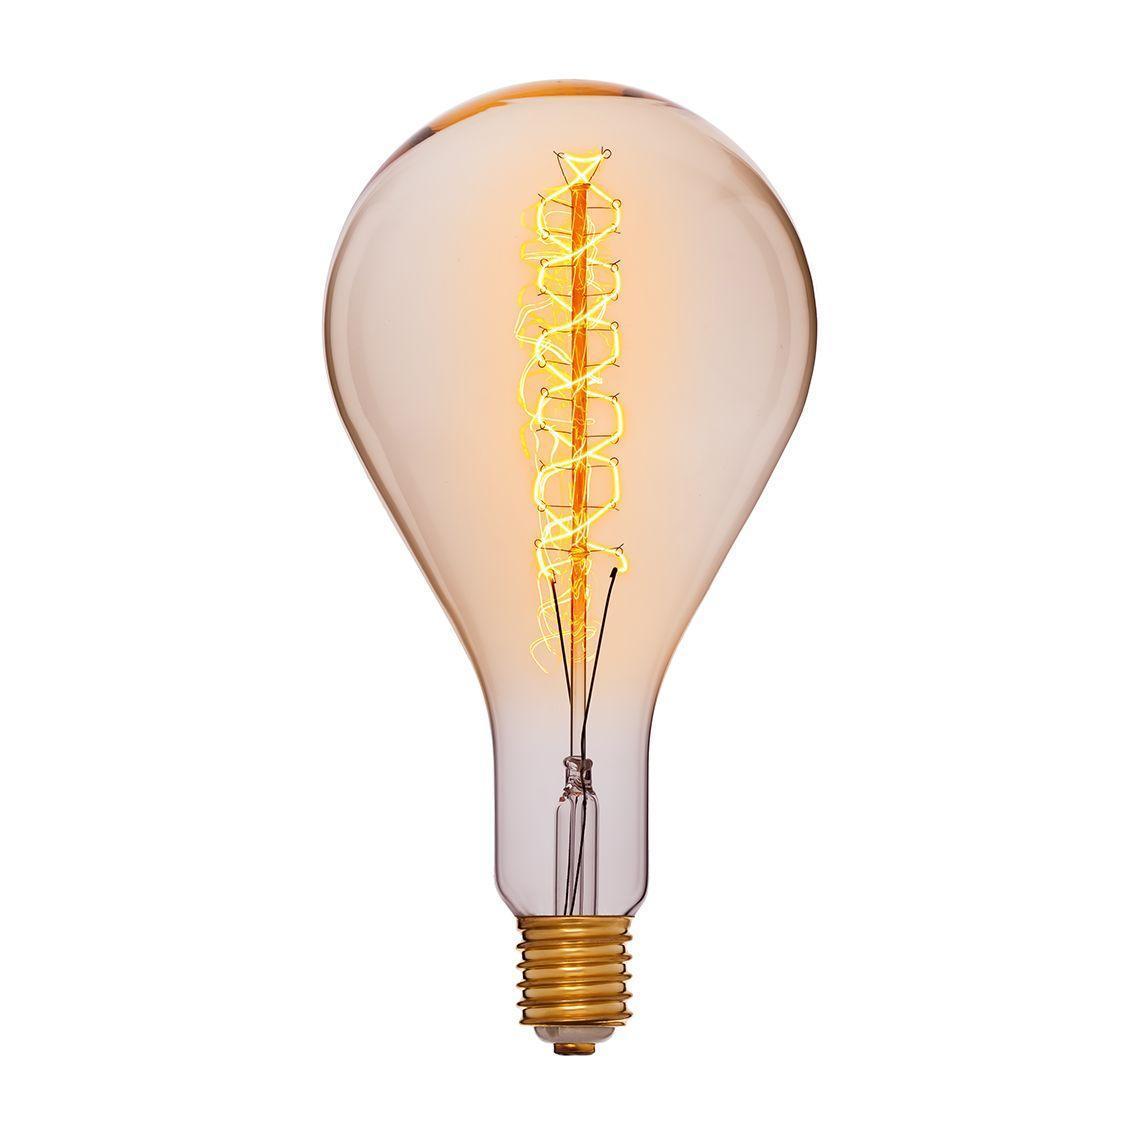 Лампа накаливания E40 95W прозрачная 053-716 цена